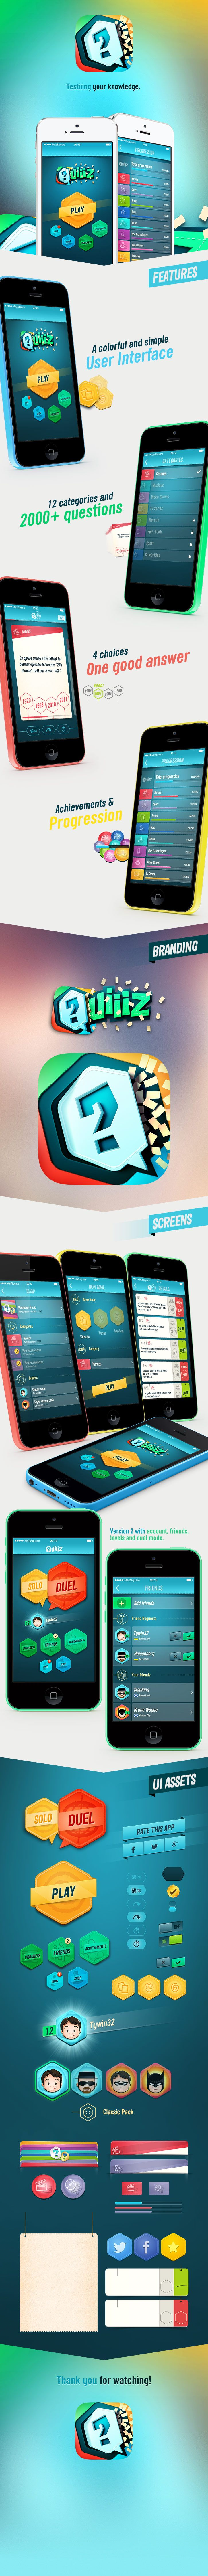 Case study of an iOS Game, Quiiiz. https://www.behance.net/gallery/19178543/Quiiiz-iOS-Game